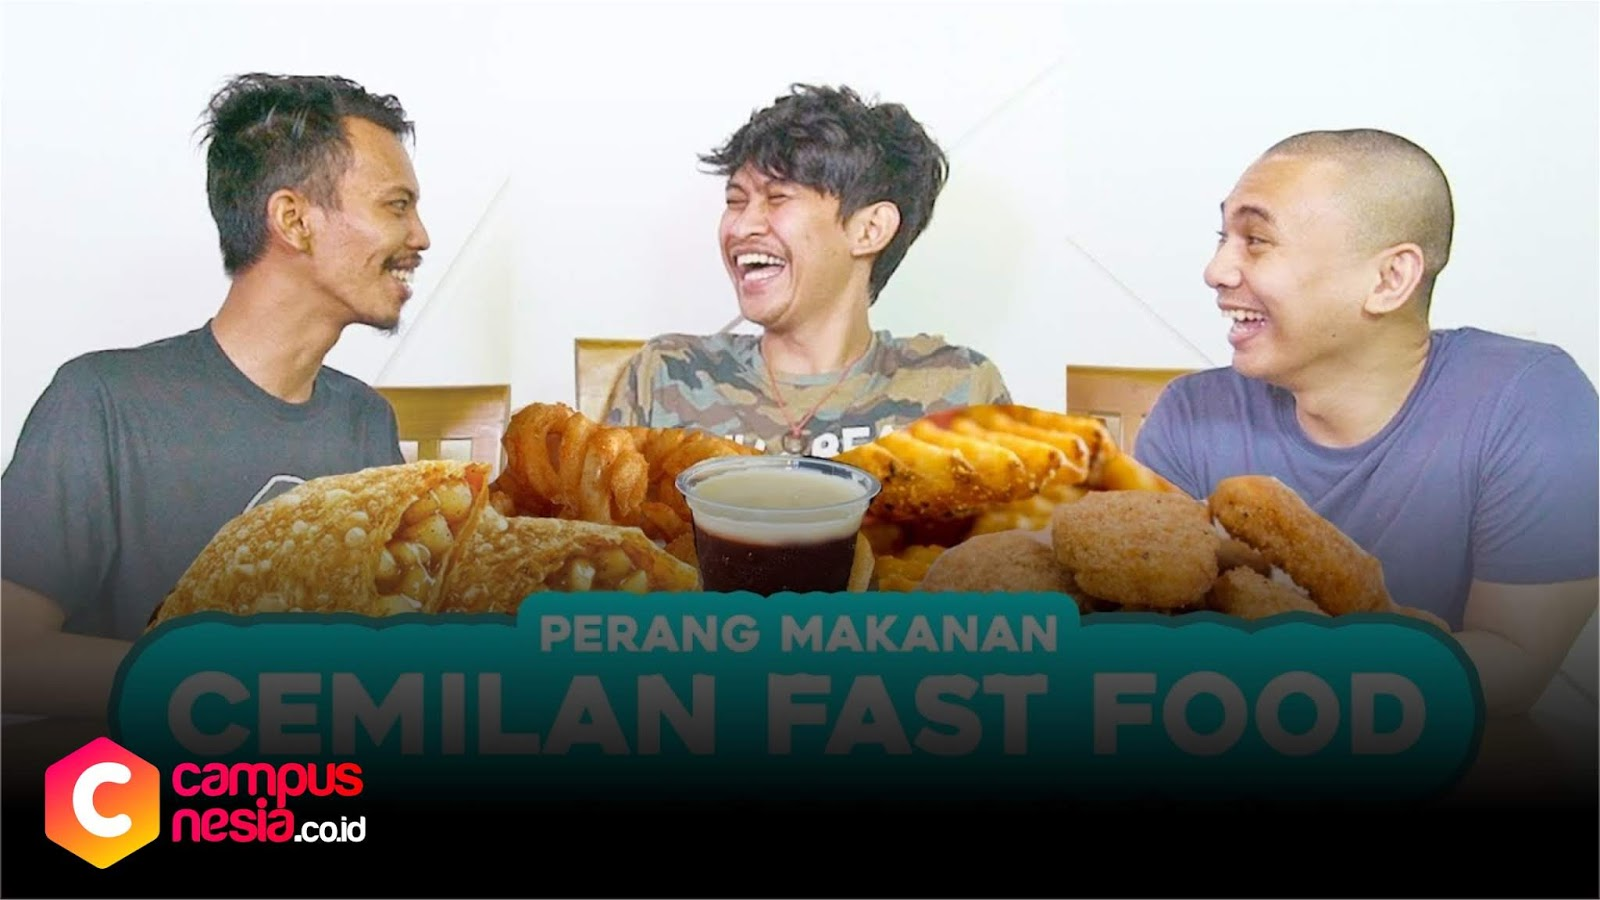 6 Channel Youtube Kuliner Terbaik Versi Campusnesia Campusnesia